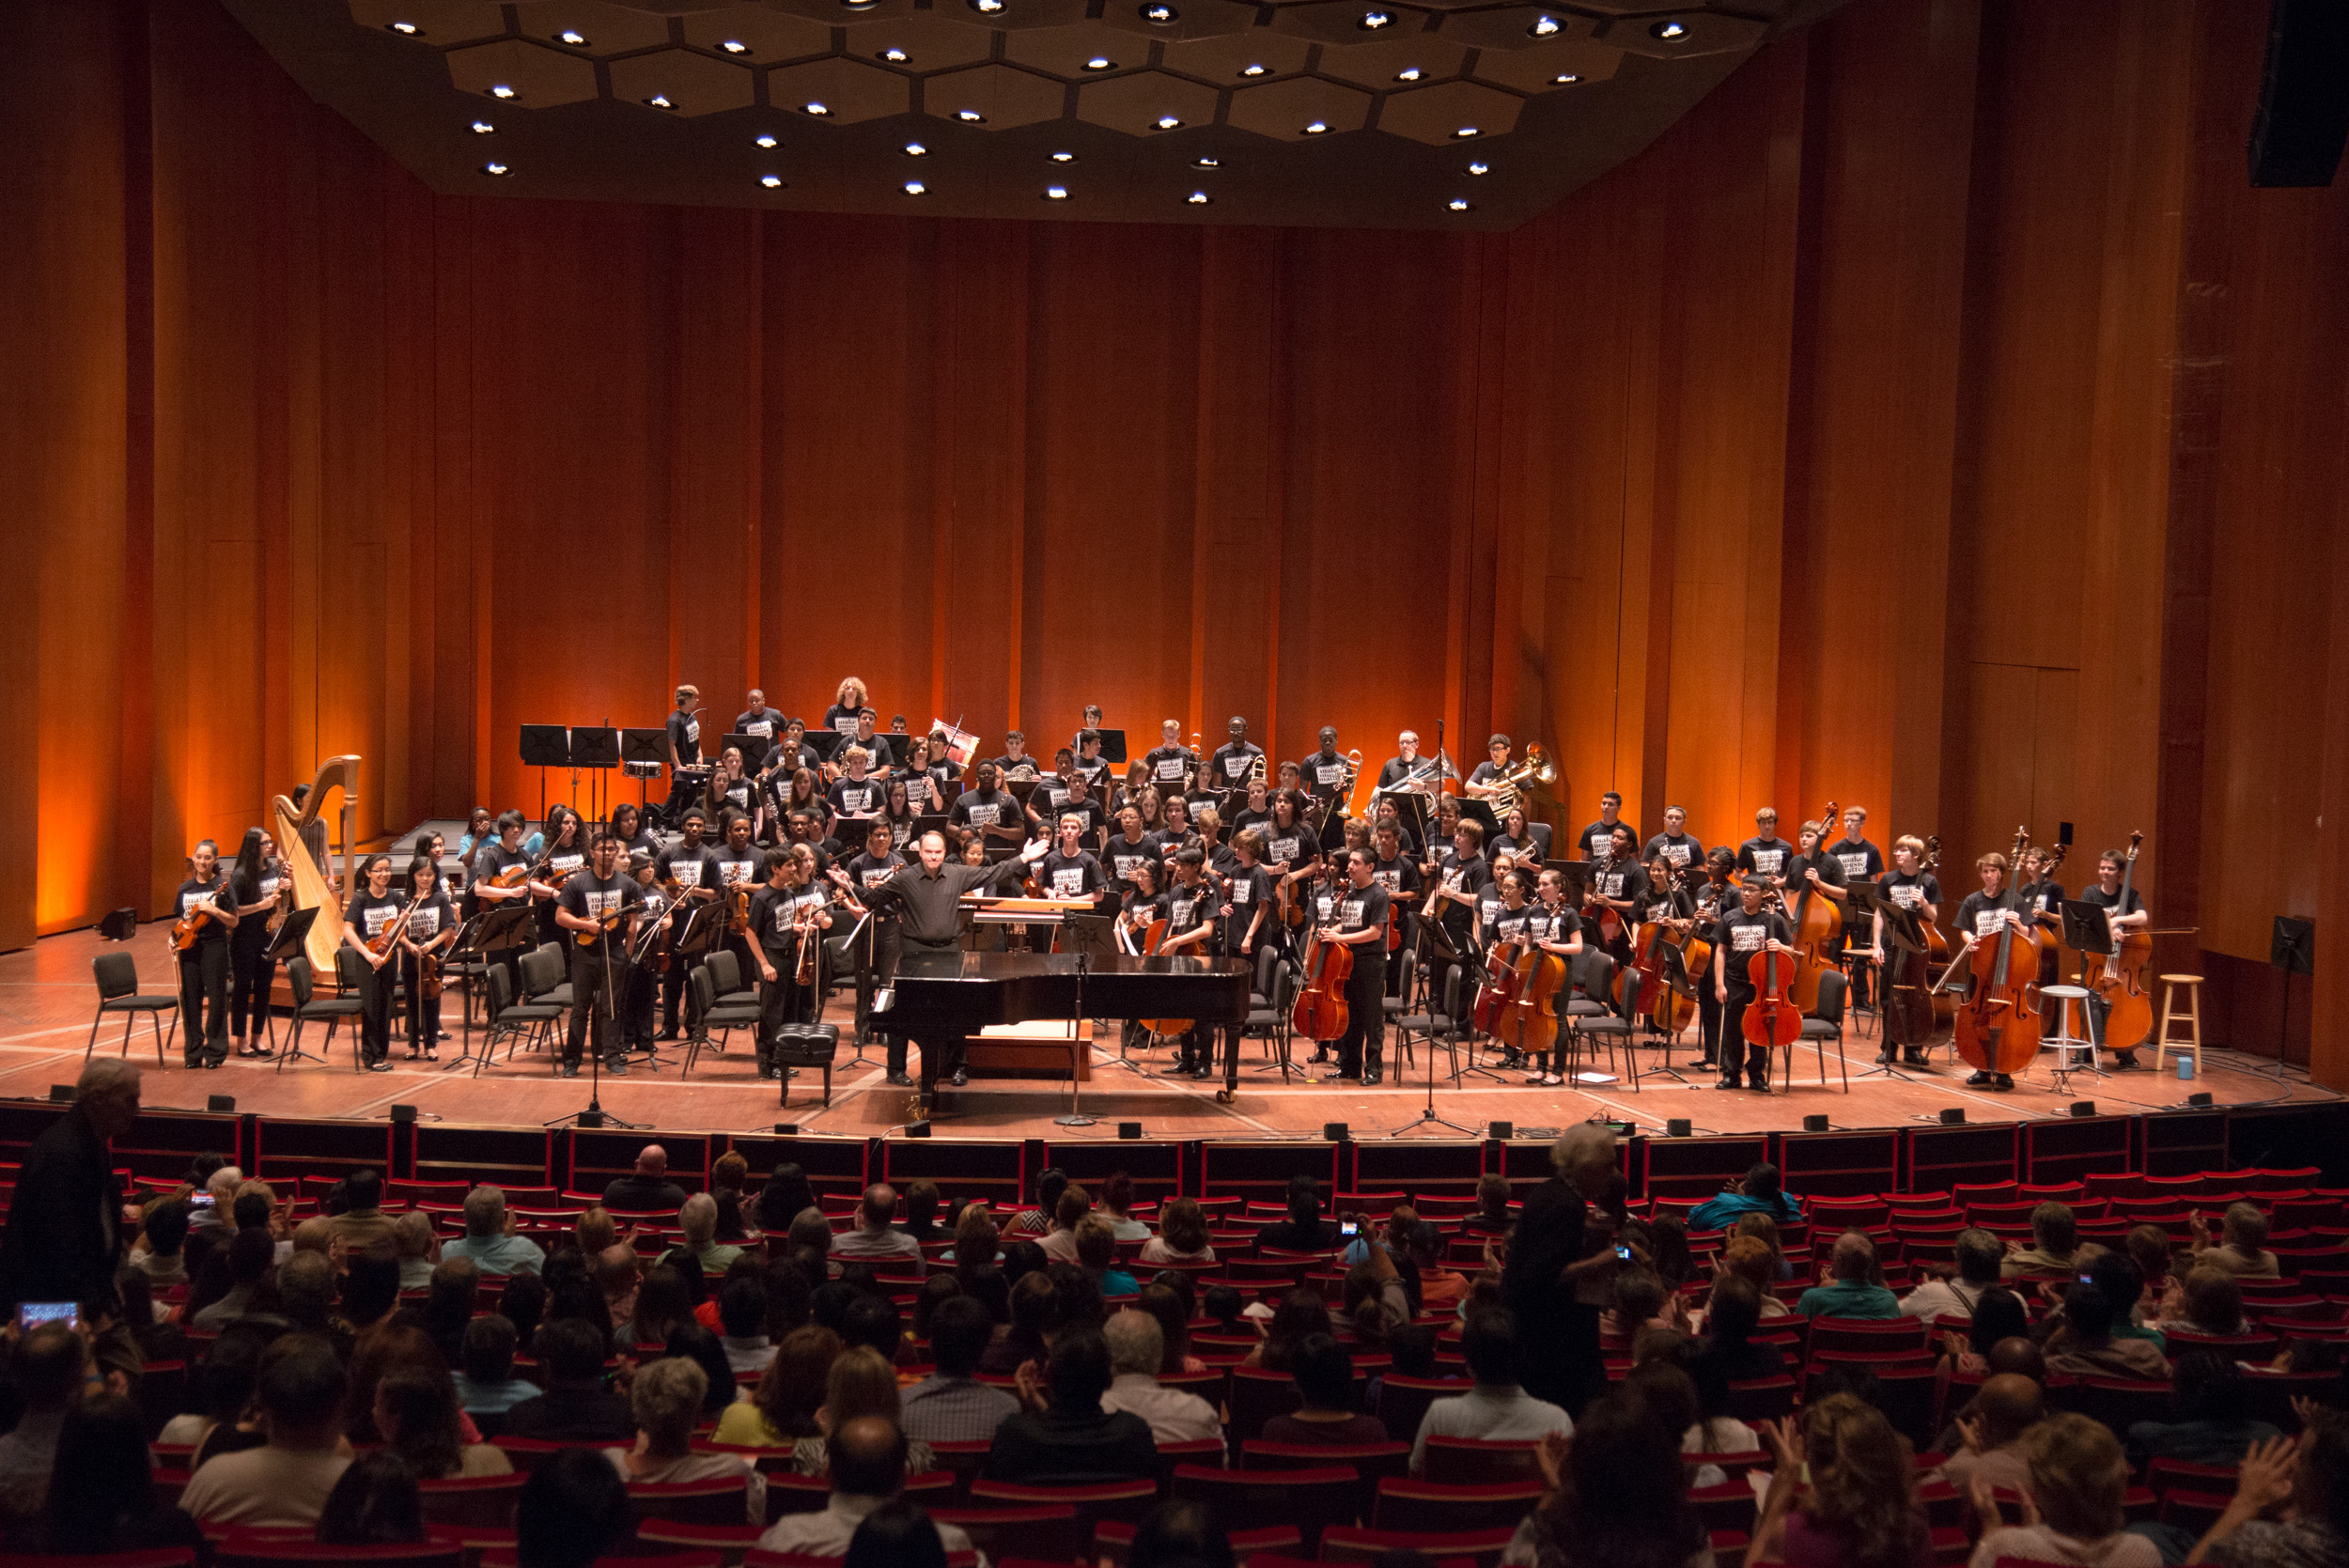 070616 Symphony Orchestra on Parent Educator